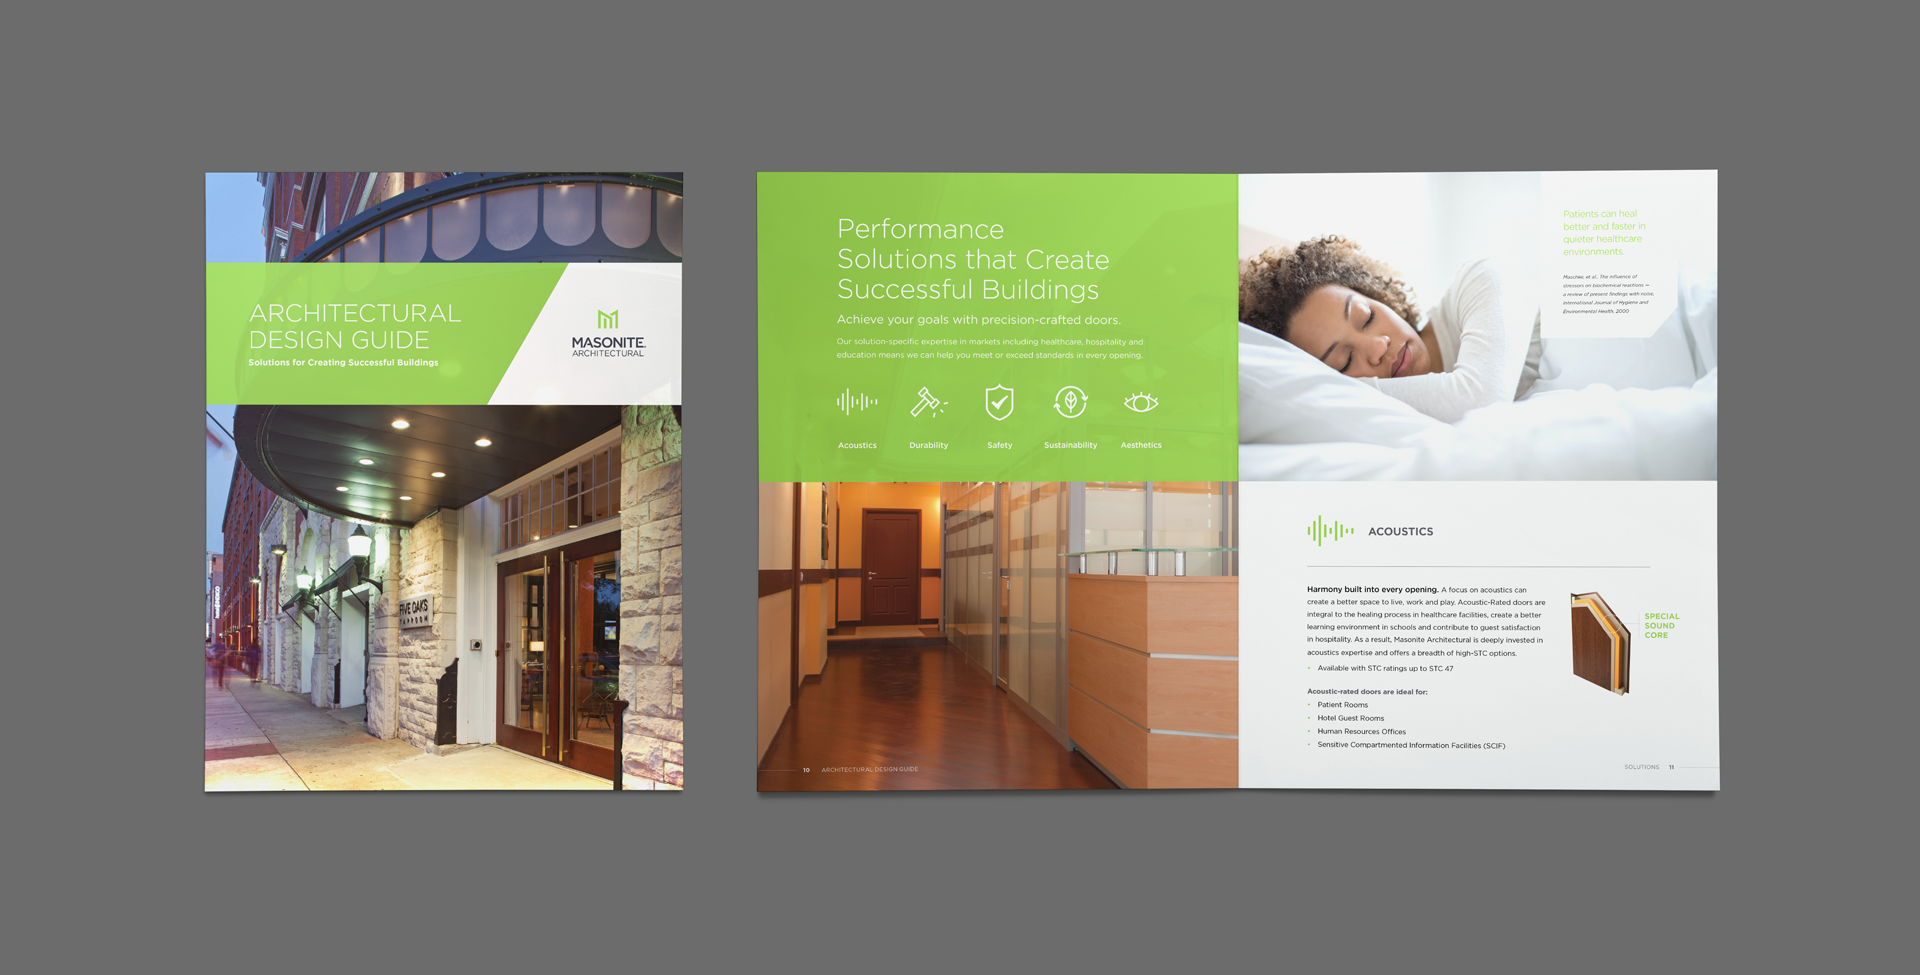 Masonite Architectural design brochure created by Interrupt